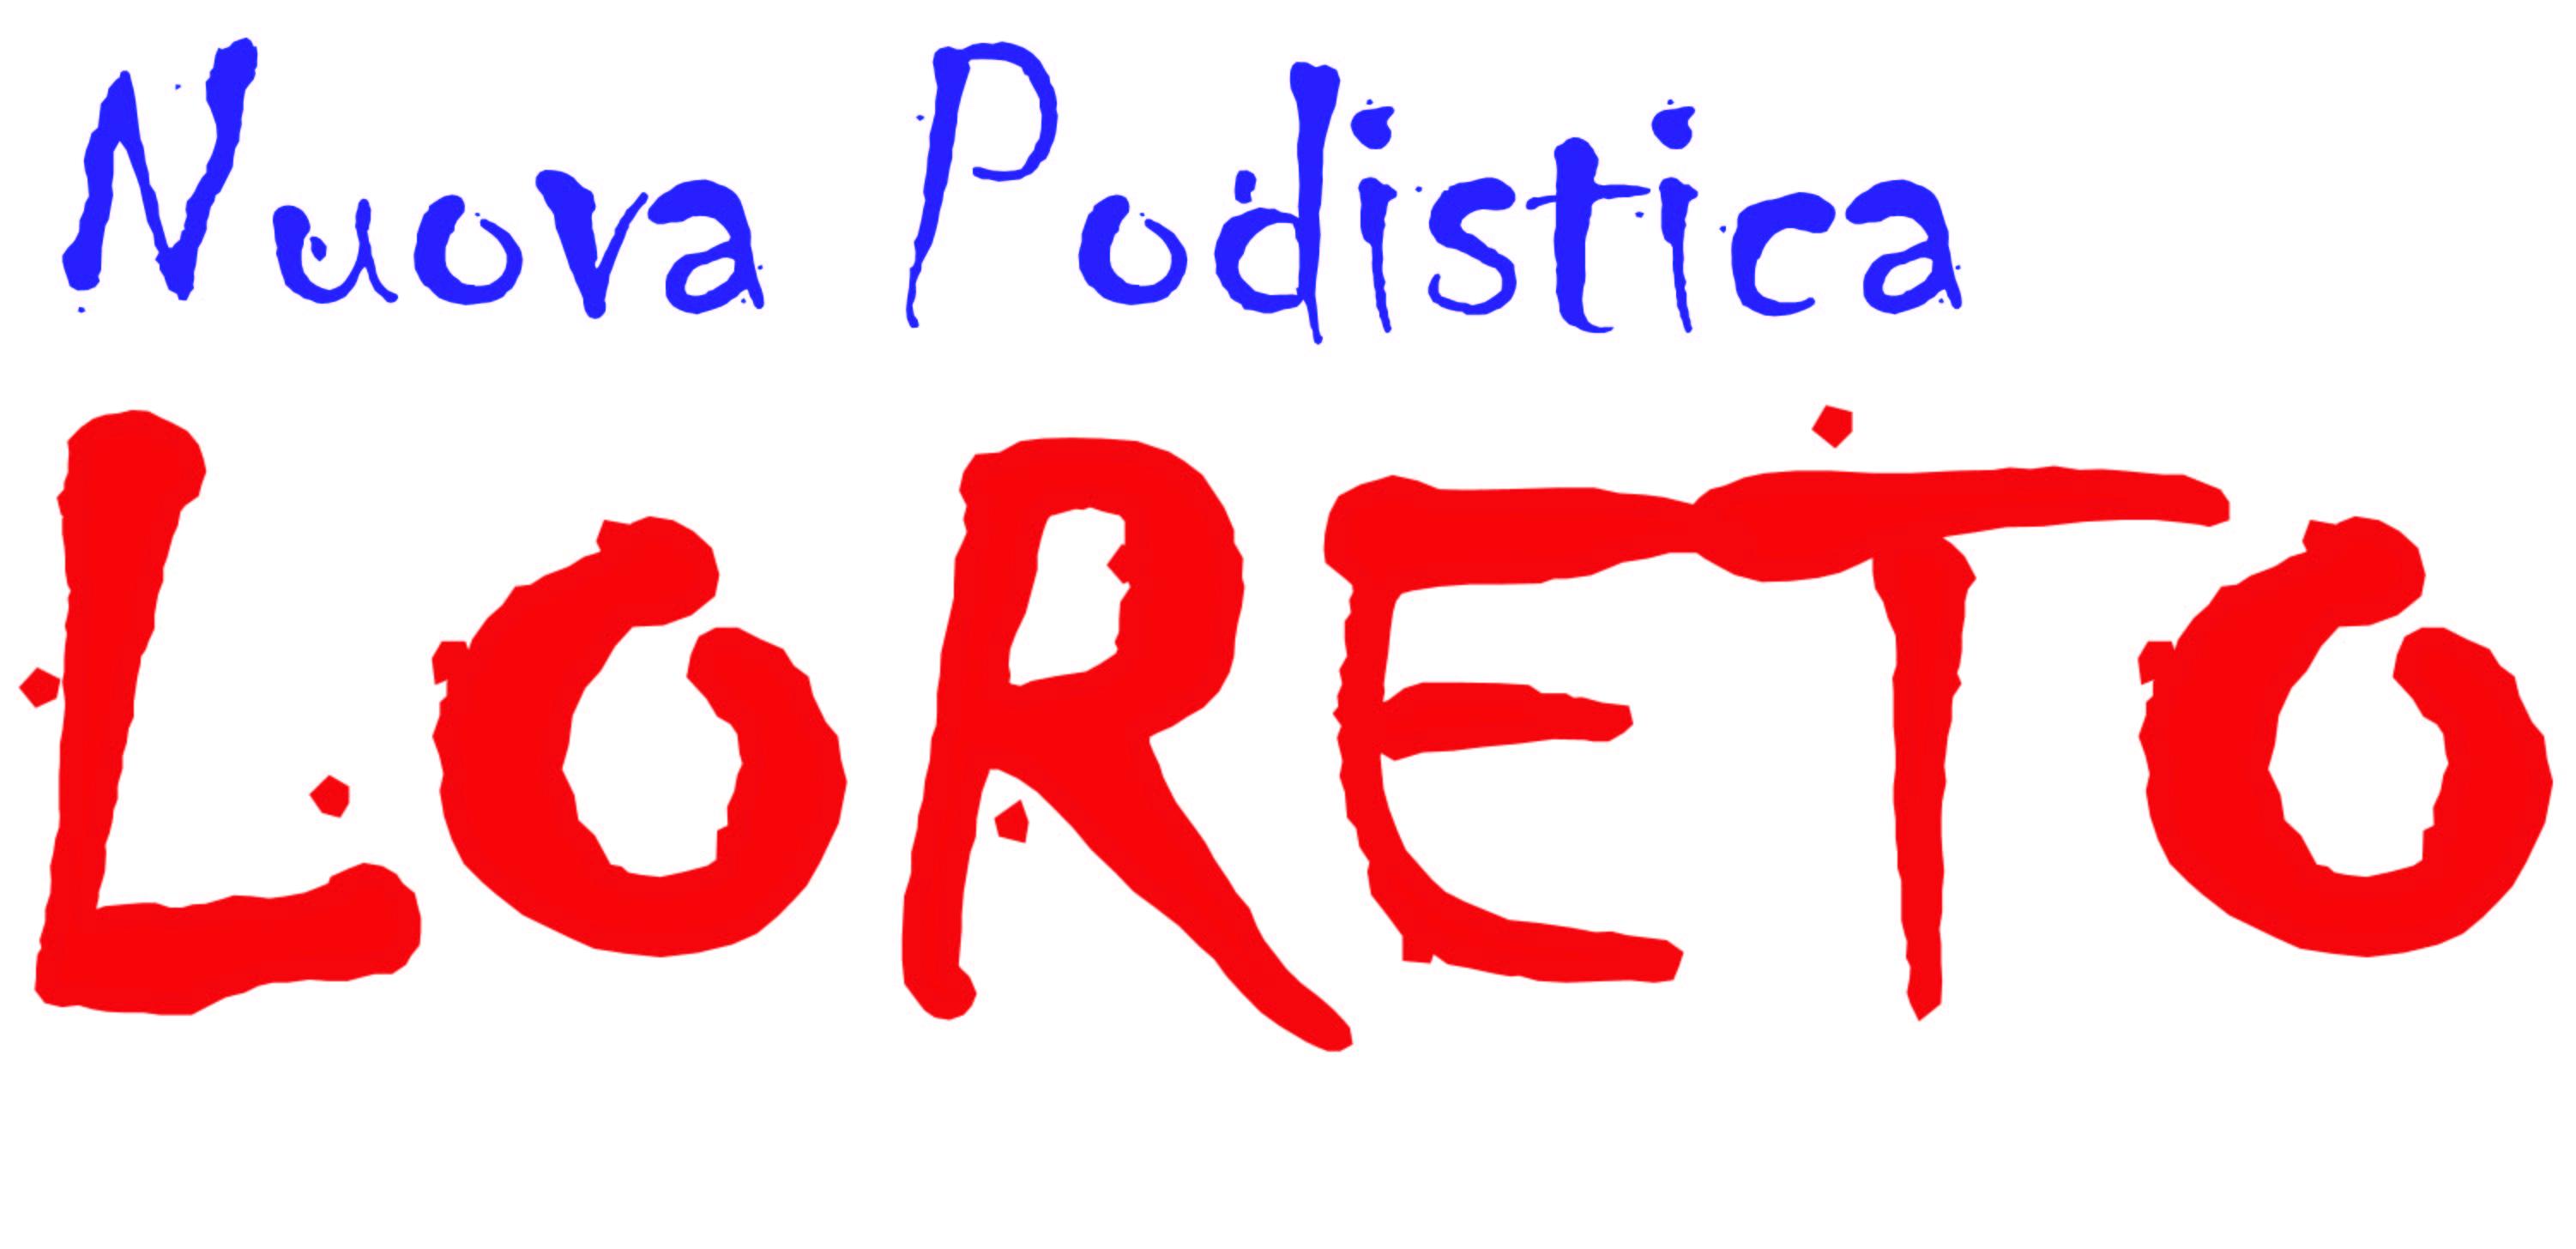 Nuova Podistica Loreto